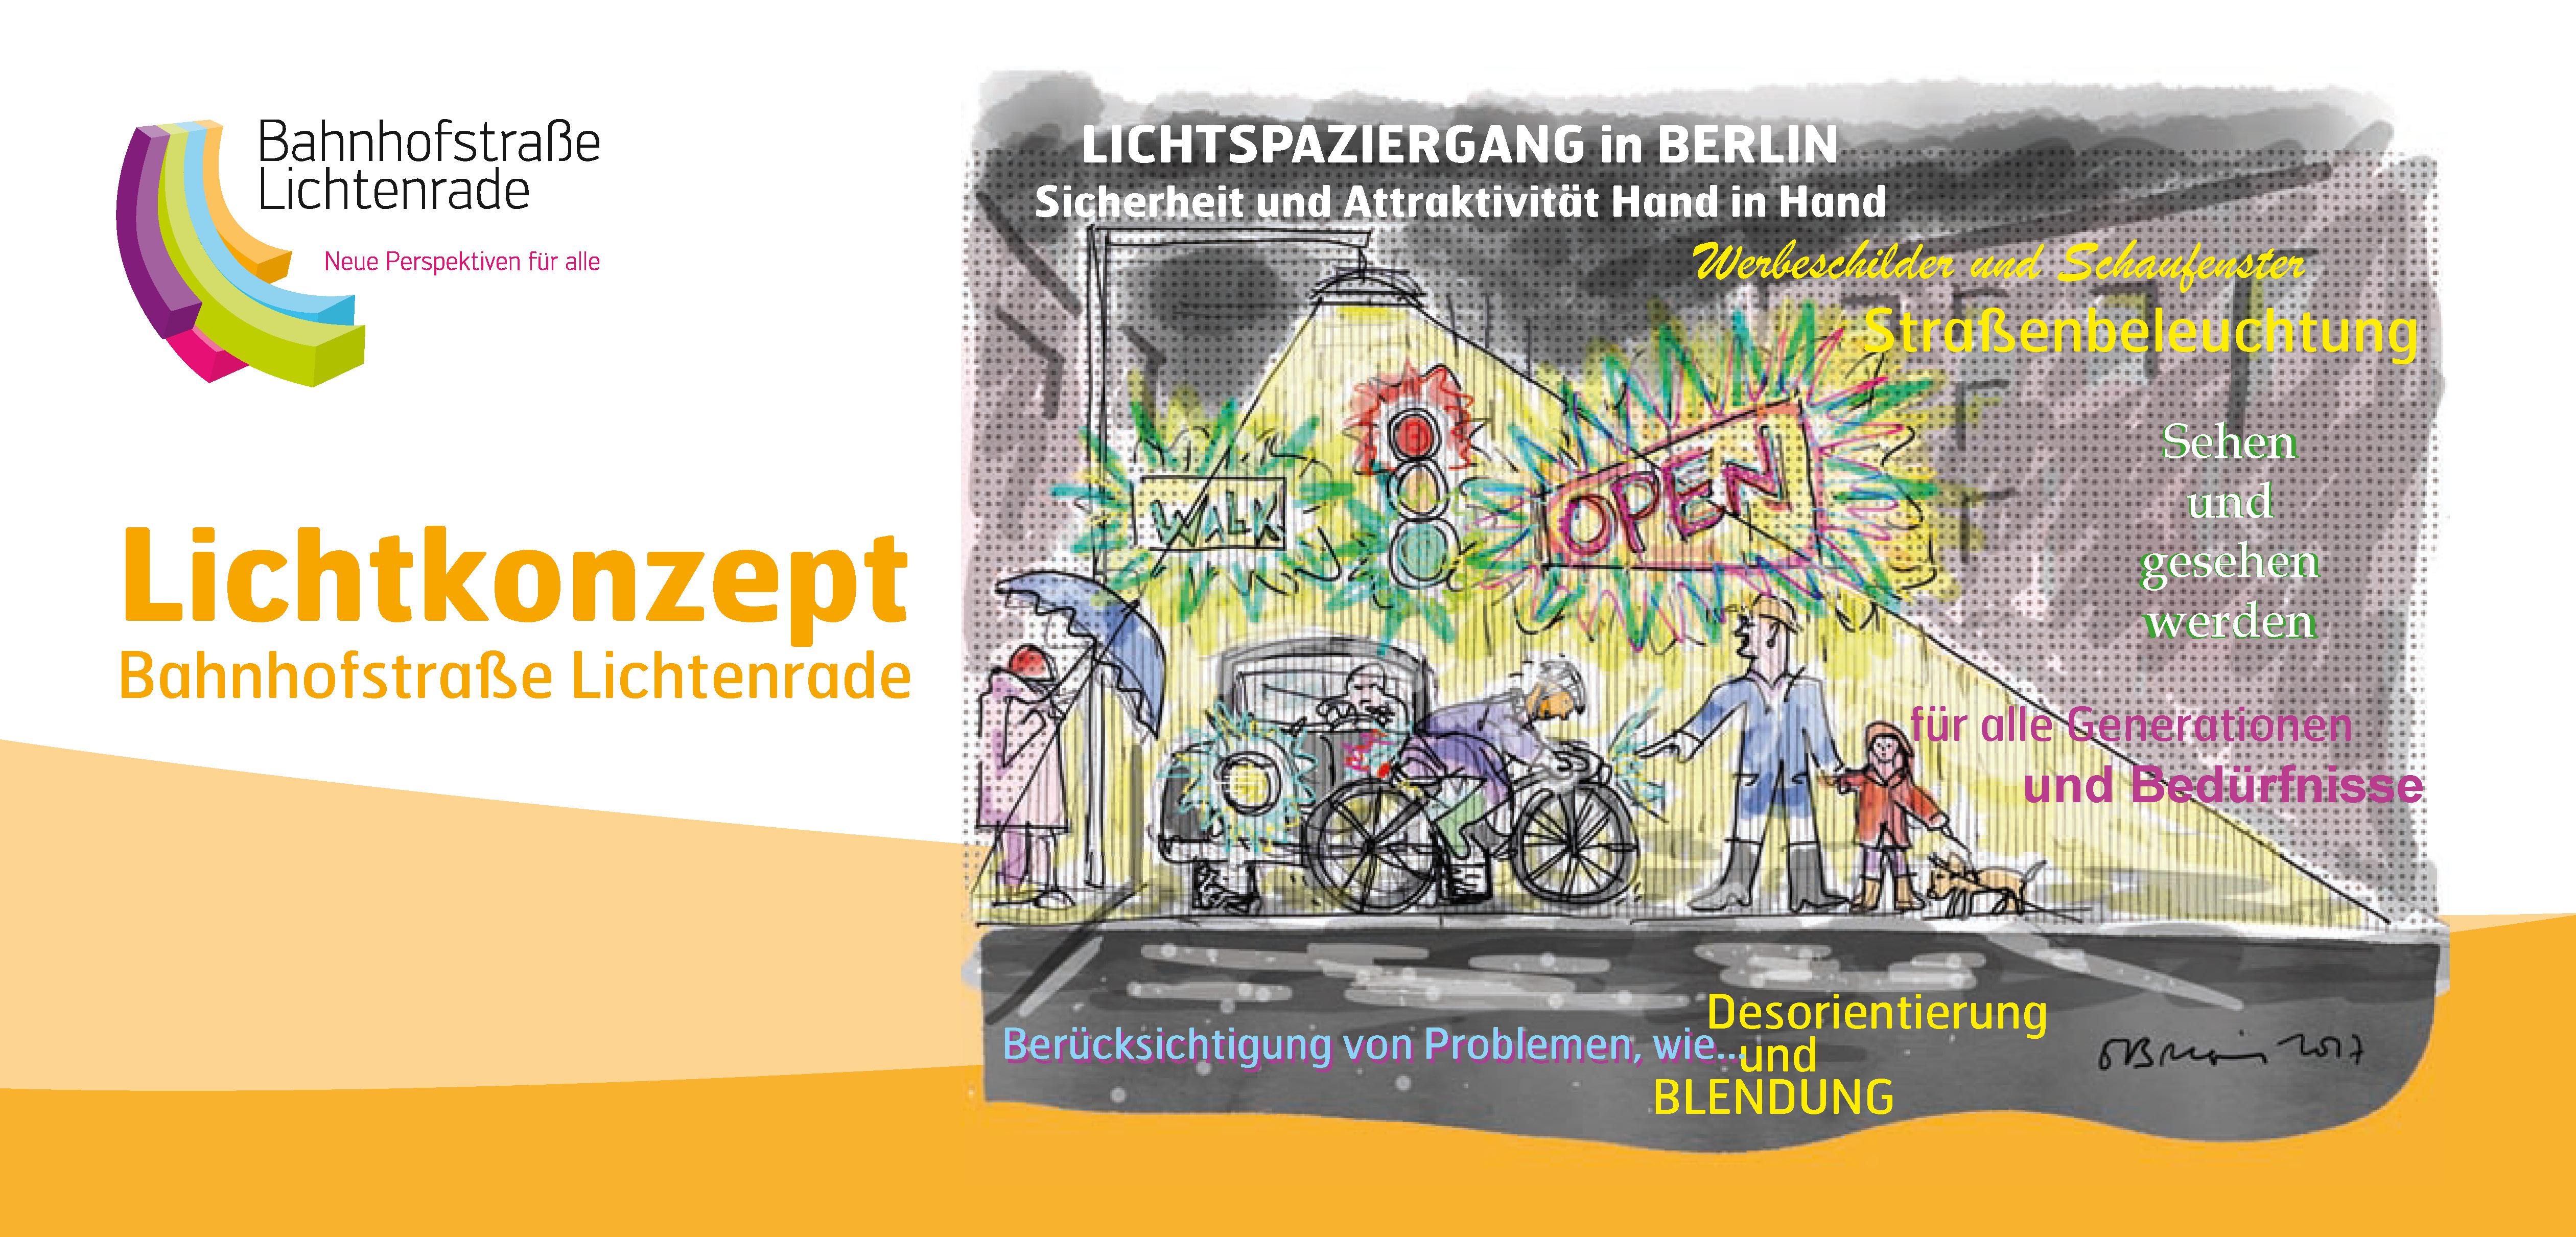 Der offizielle Flyer zum Lichtspaziergang entlang der Bahnhofstraße Berlin-Lichtenrade.